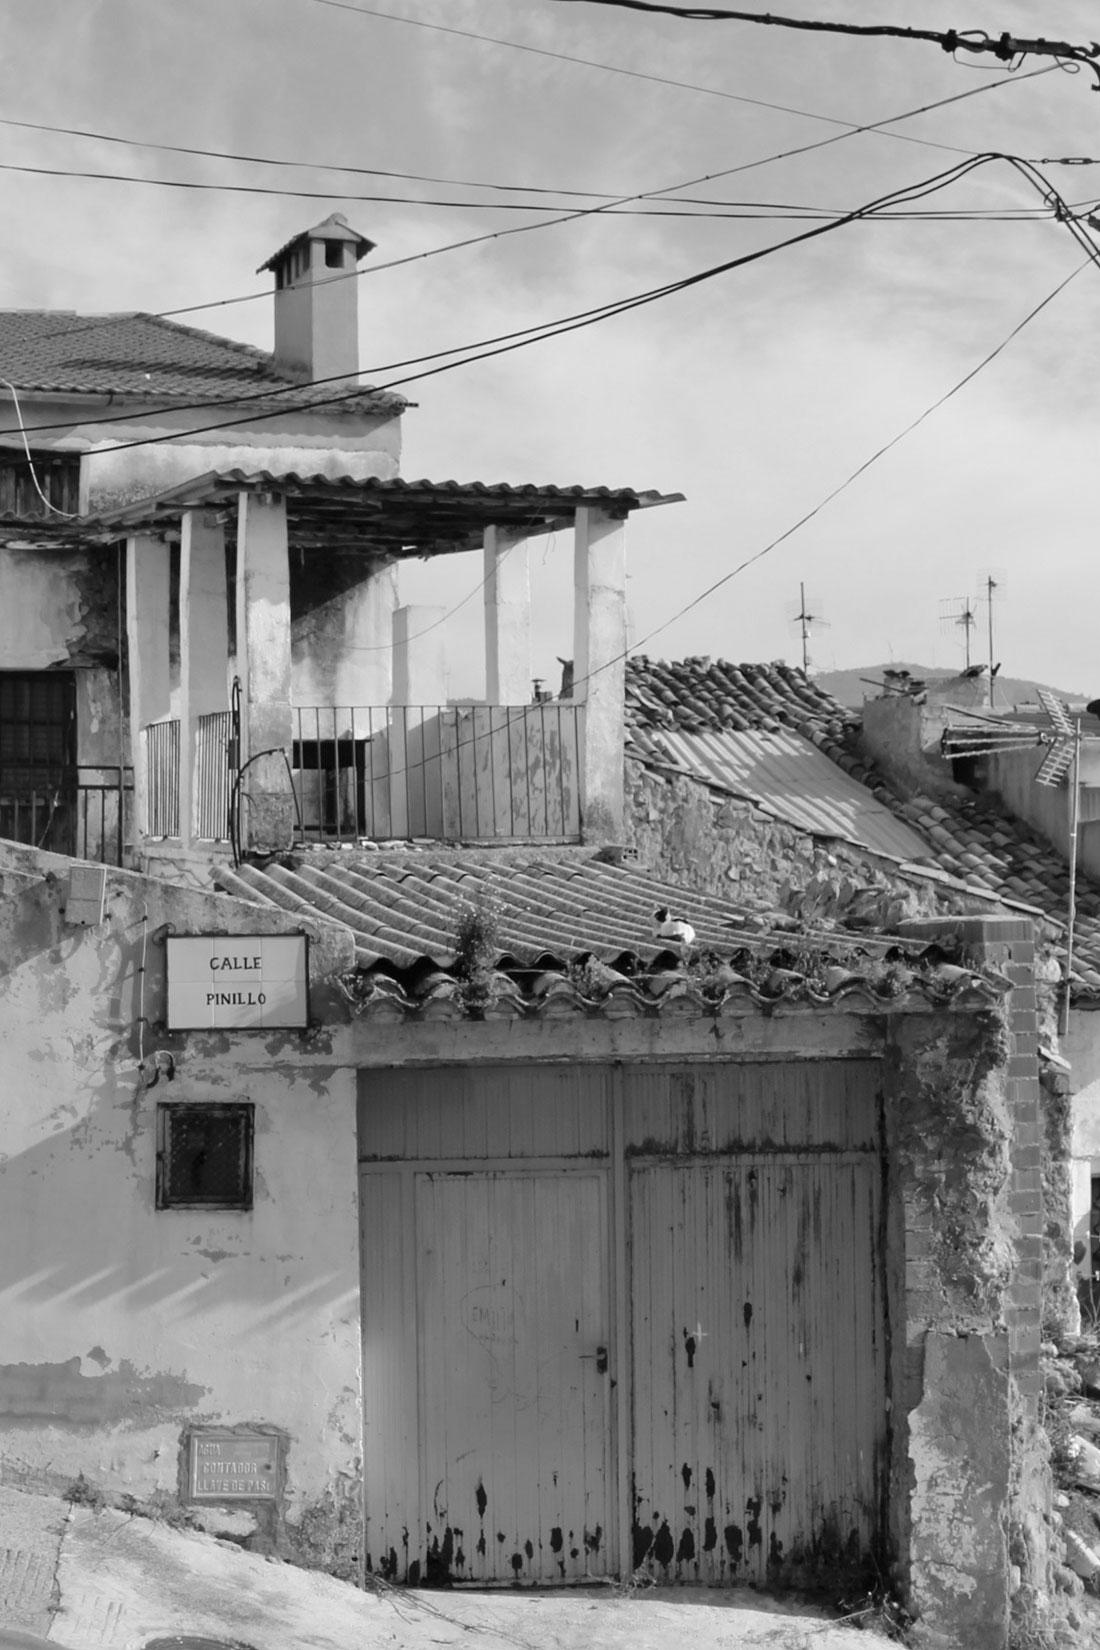 Centro-Dramatico-Rural-Mira-Cuenca-Danza-Calles-03